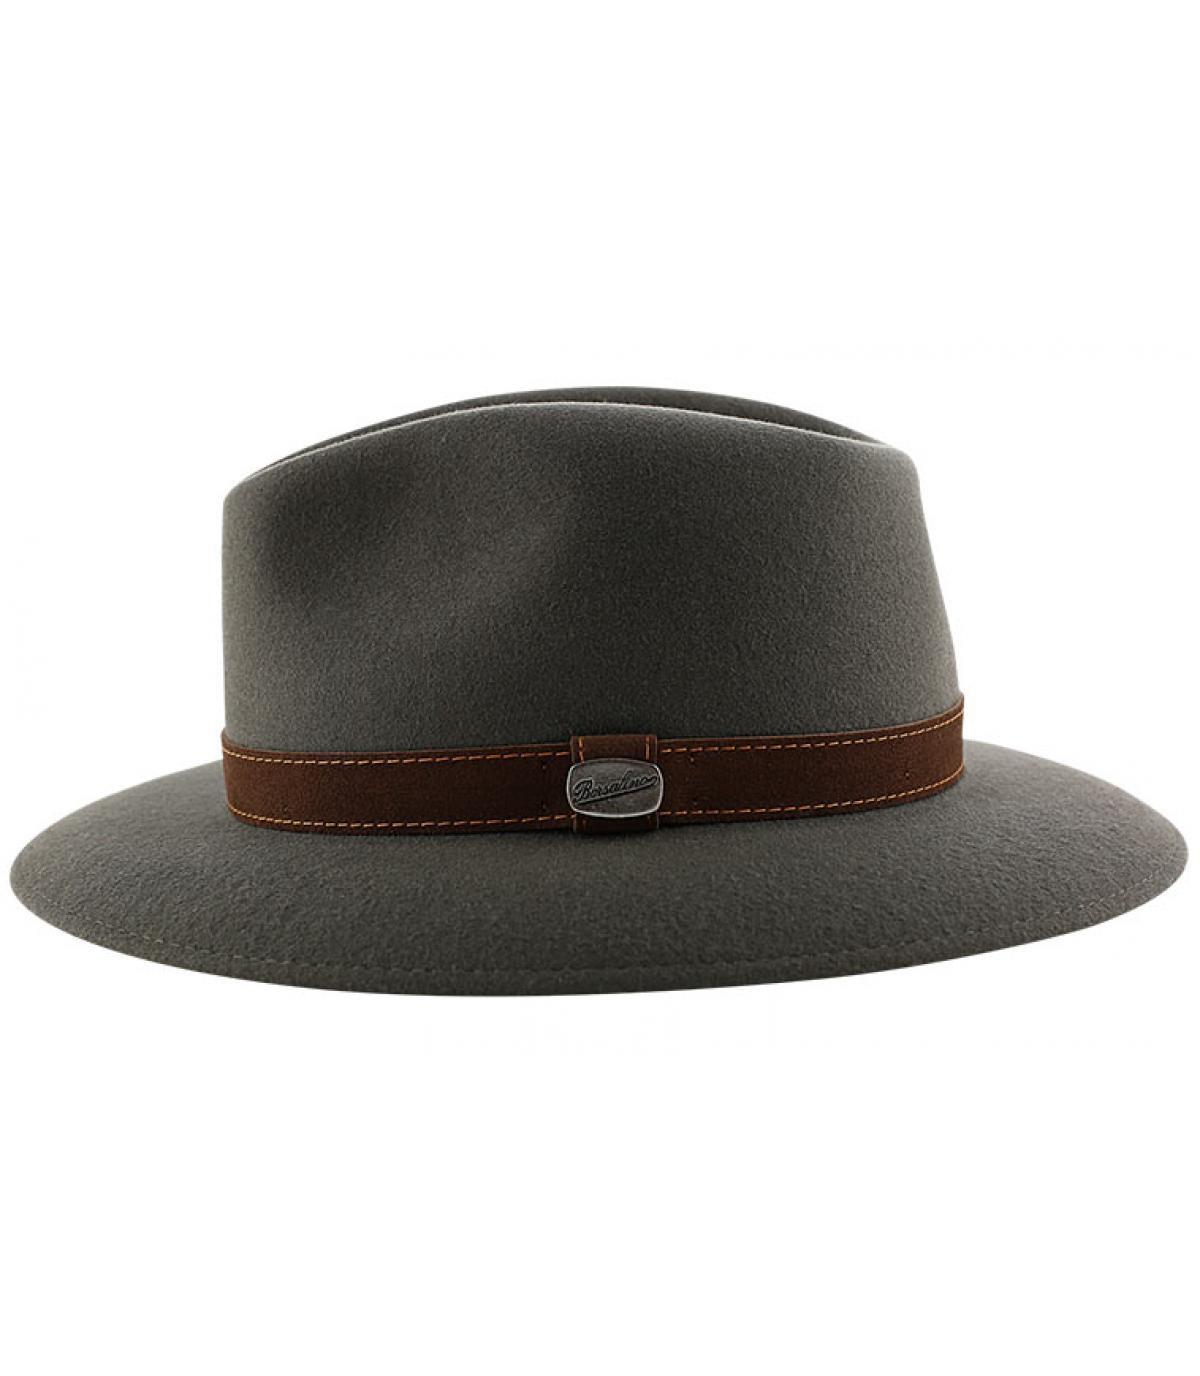 Details Alessandria grey fur felt hat - Abbildung 4